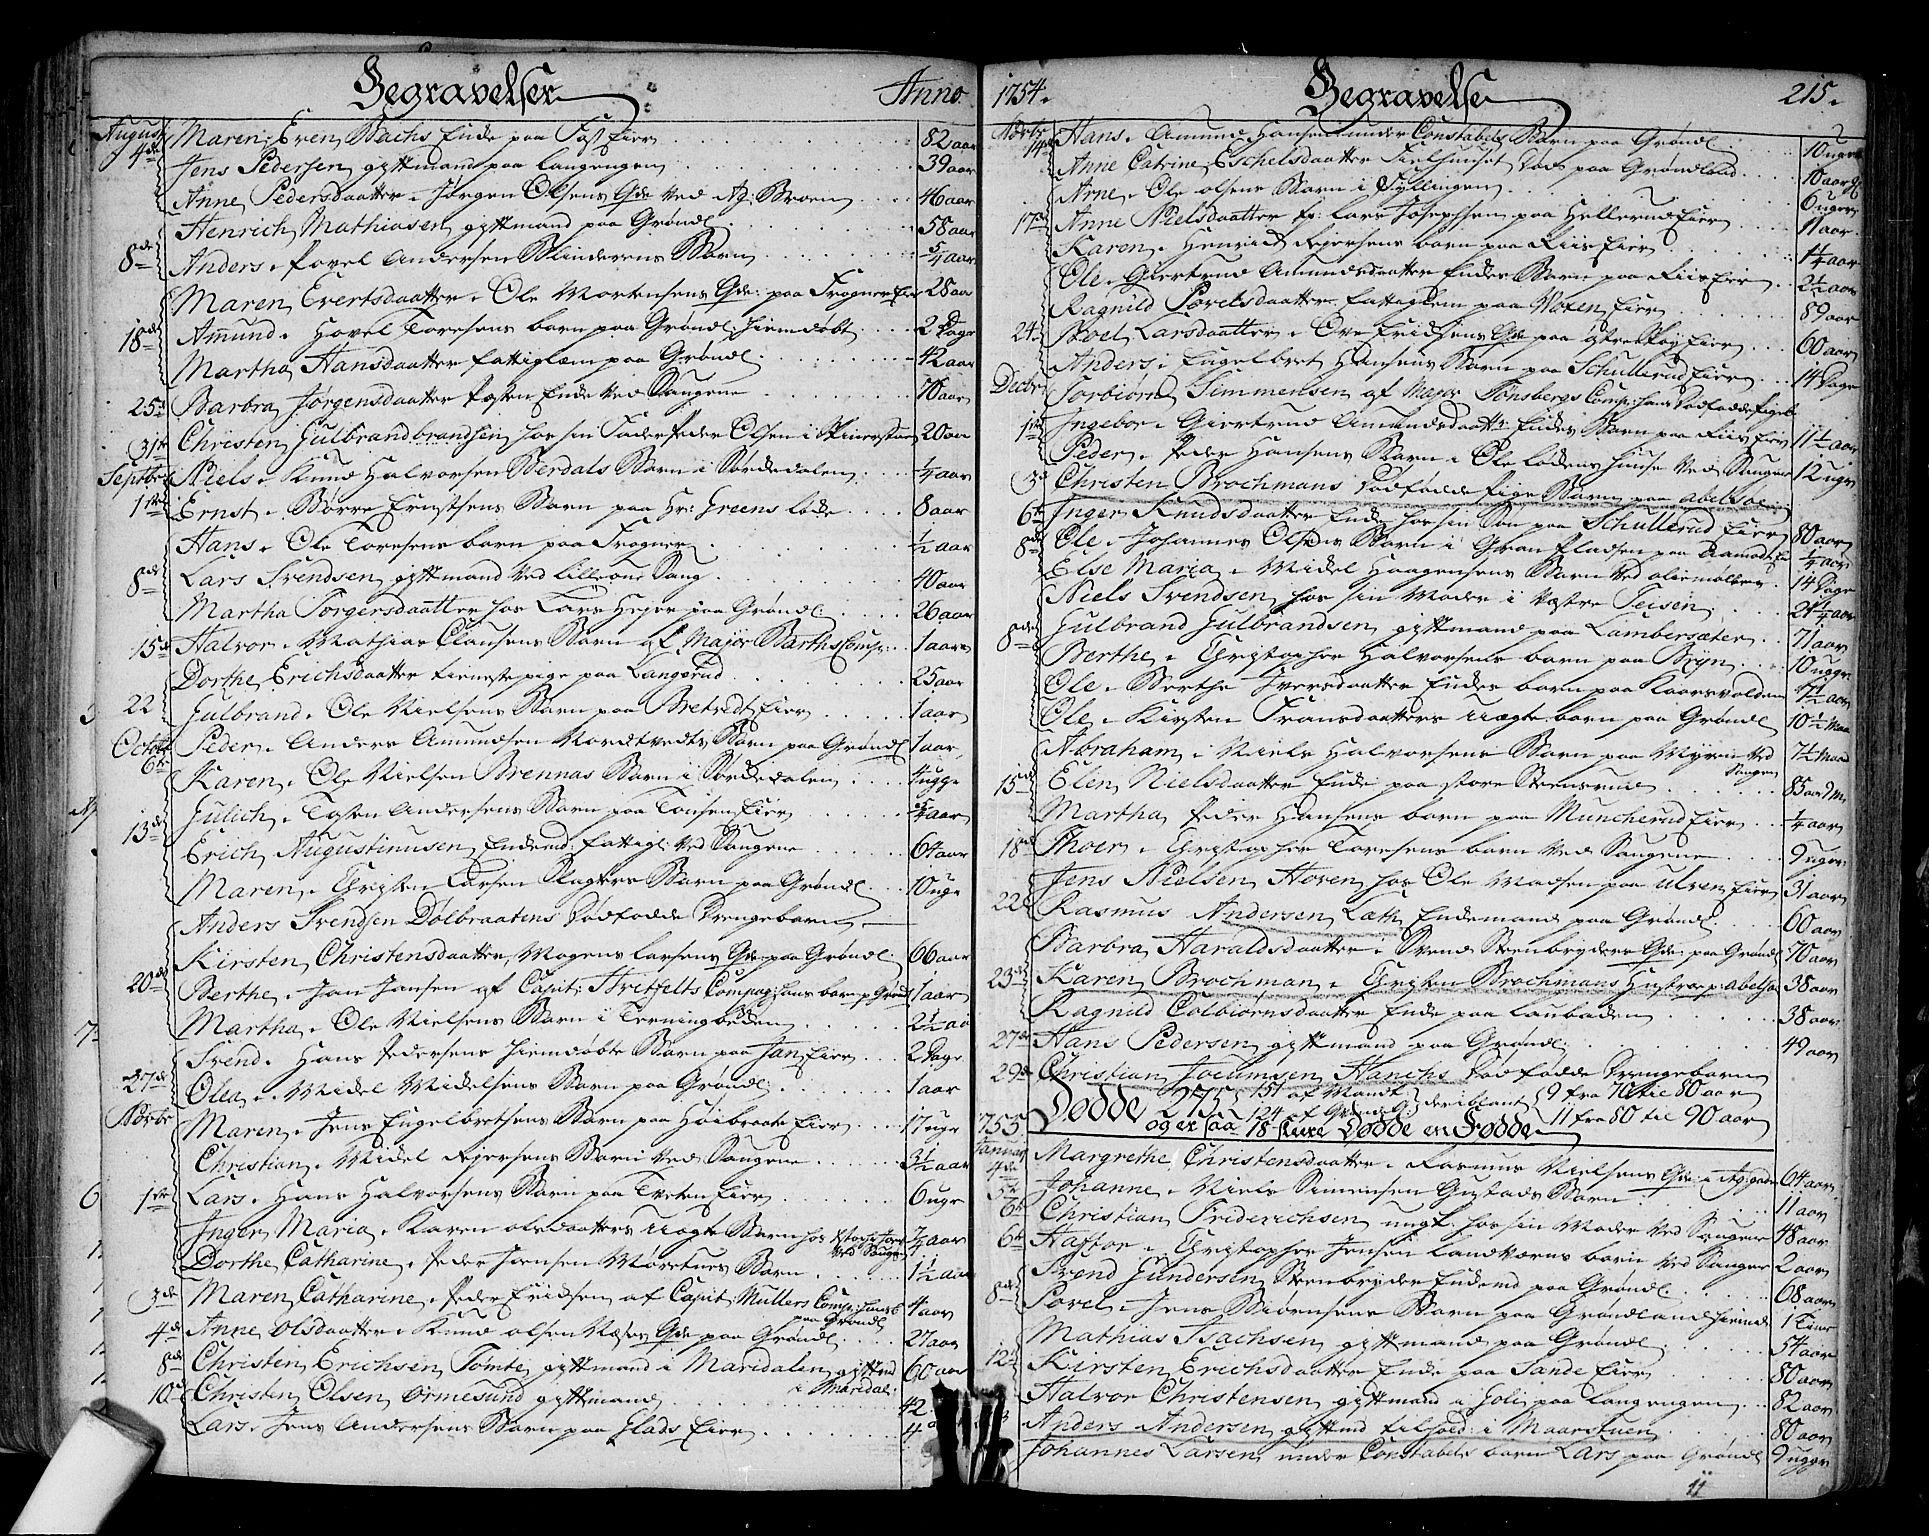 SAO, Aker prestekontor kirkebøker, F/L0008: Parish register (official) no. 8, 1749-1765, p. 215